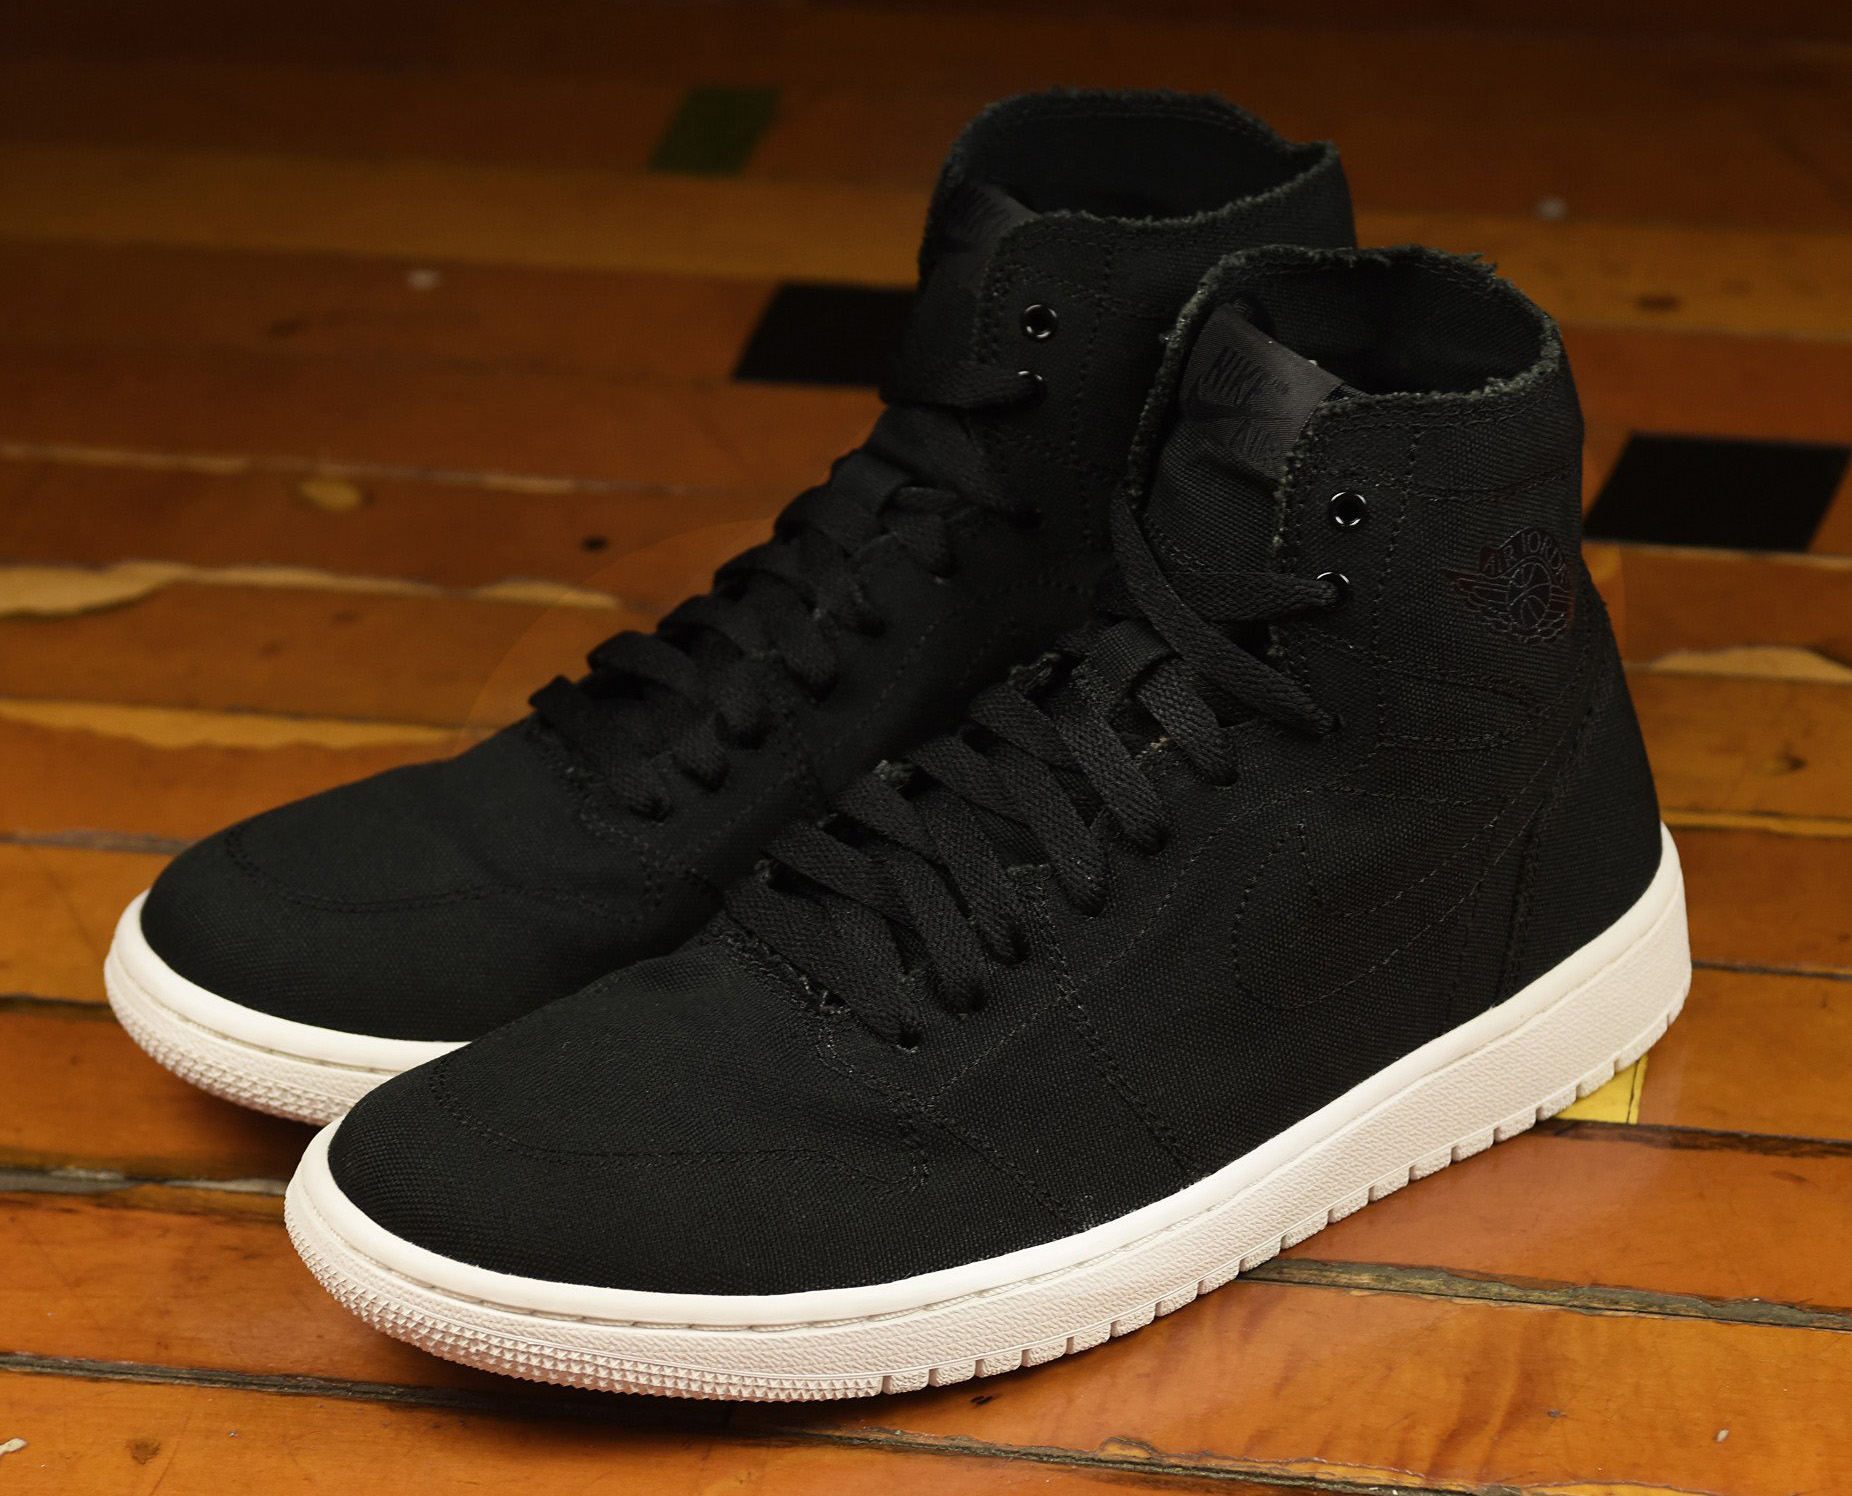 best sneakers 28e29 8dc9f Air Jordan 1 Deconstructed